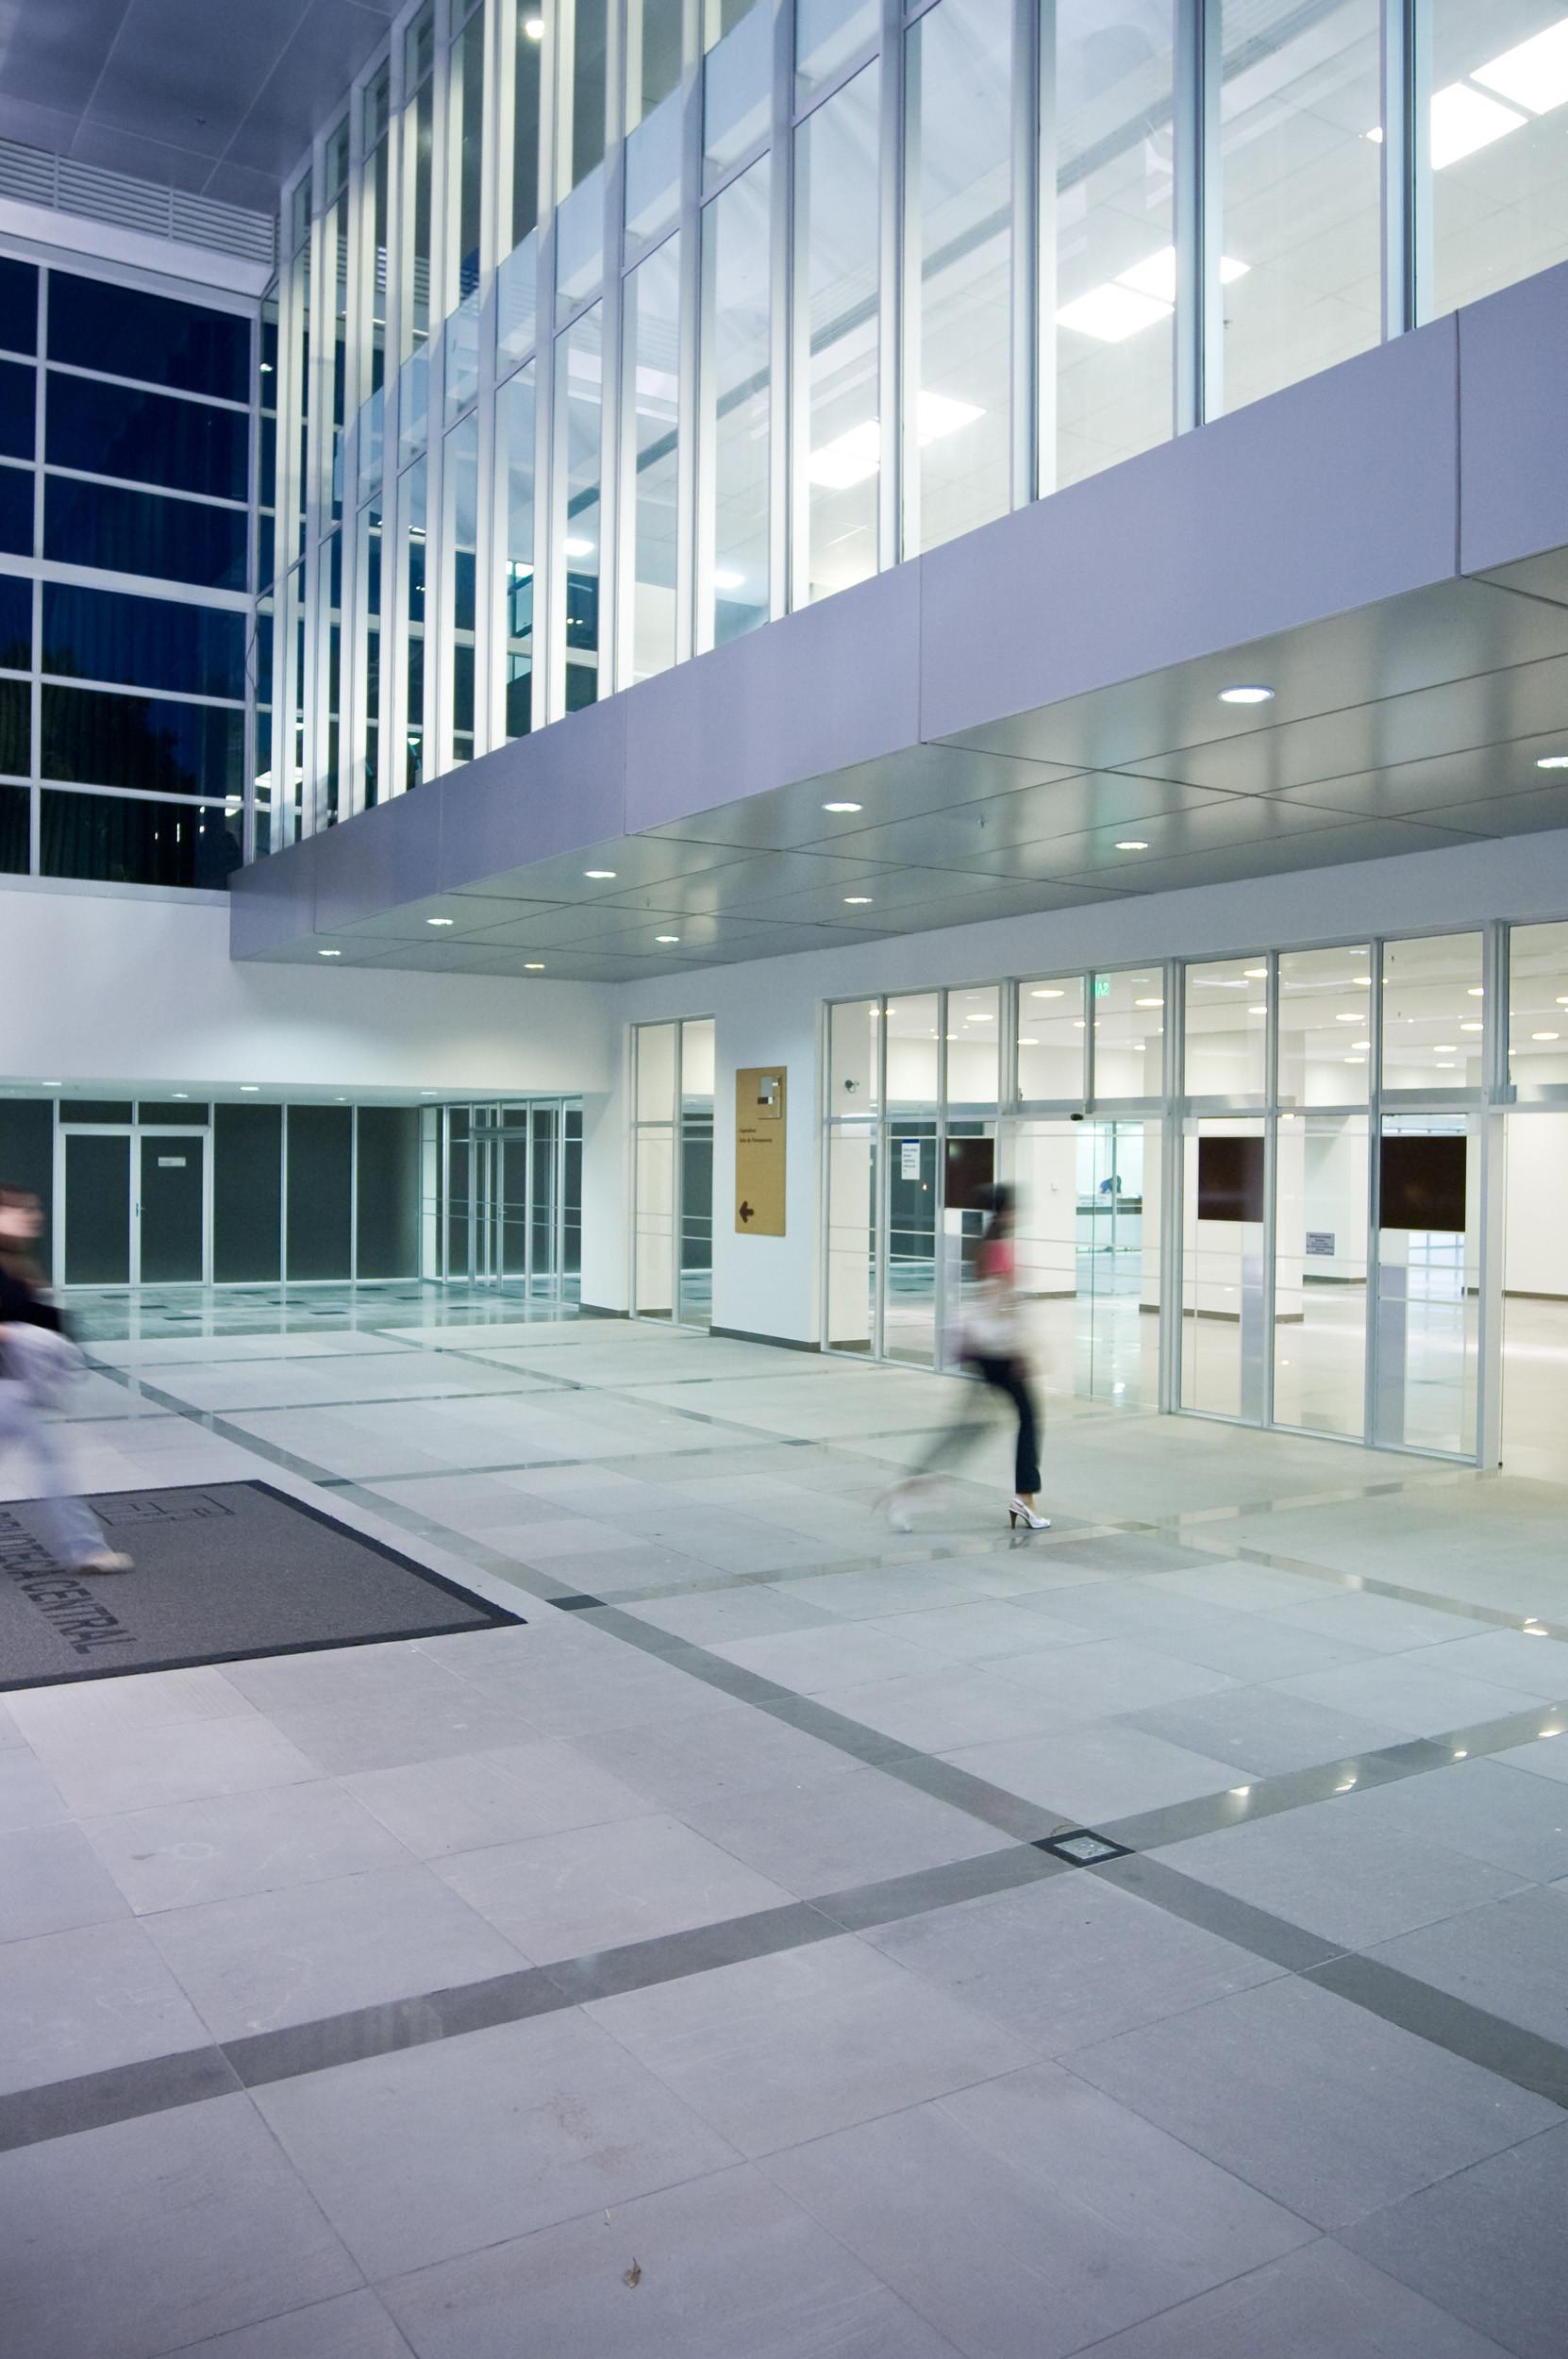 PUC-RS Library / Santini & Rocha Arquitetos